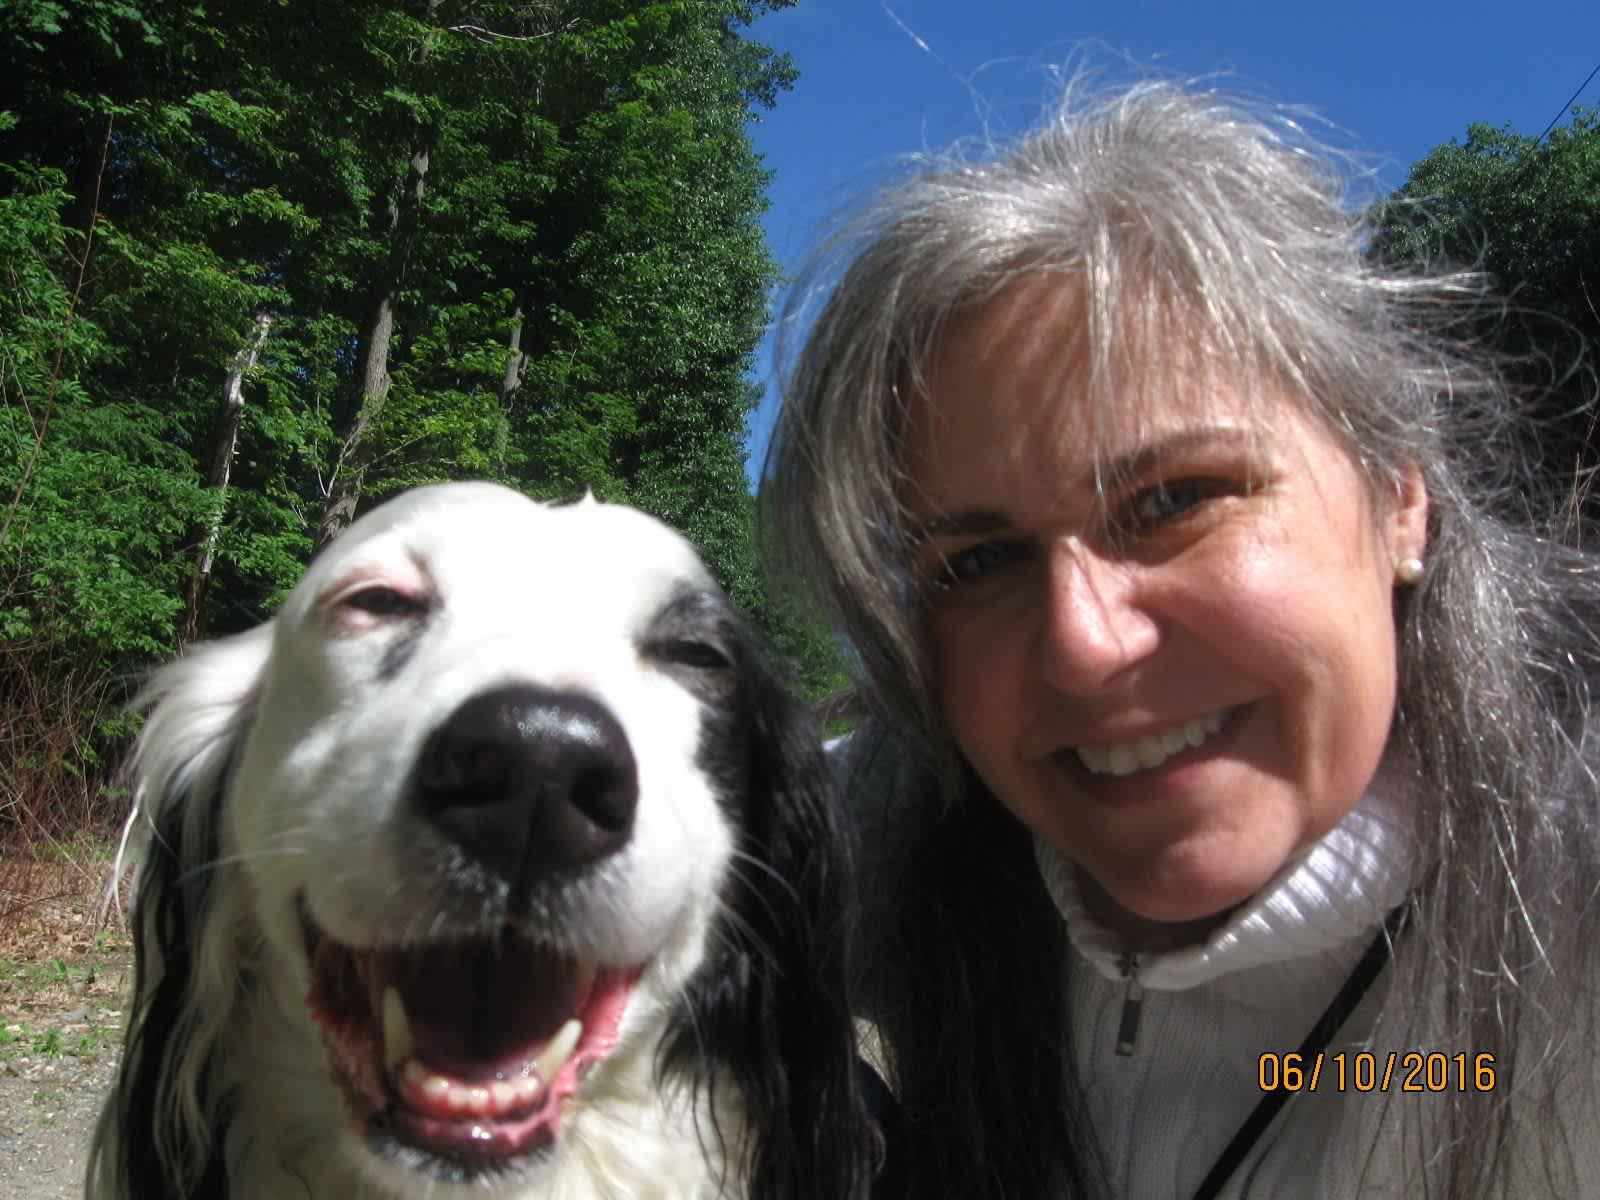 Susan from Peterborough, Ontario, Canada